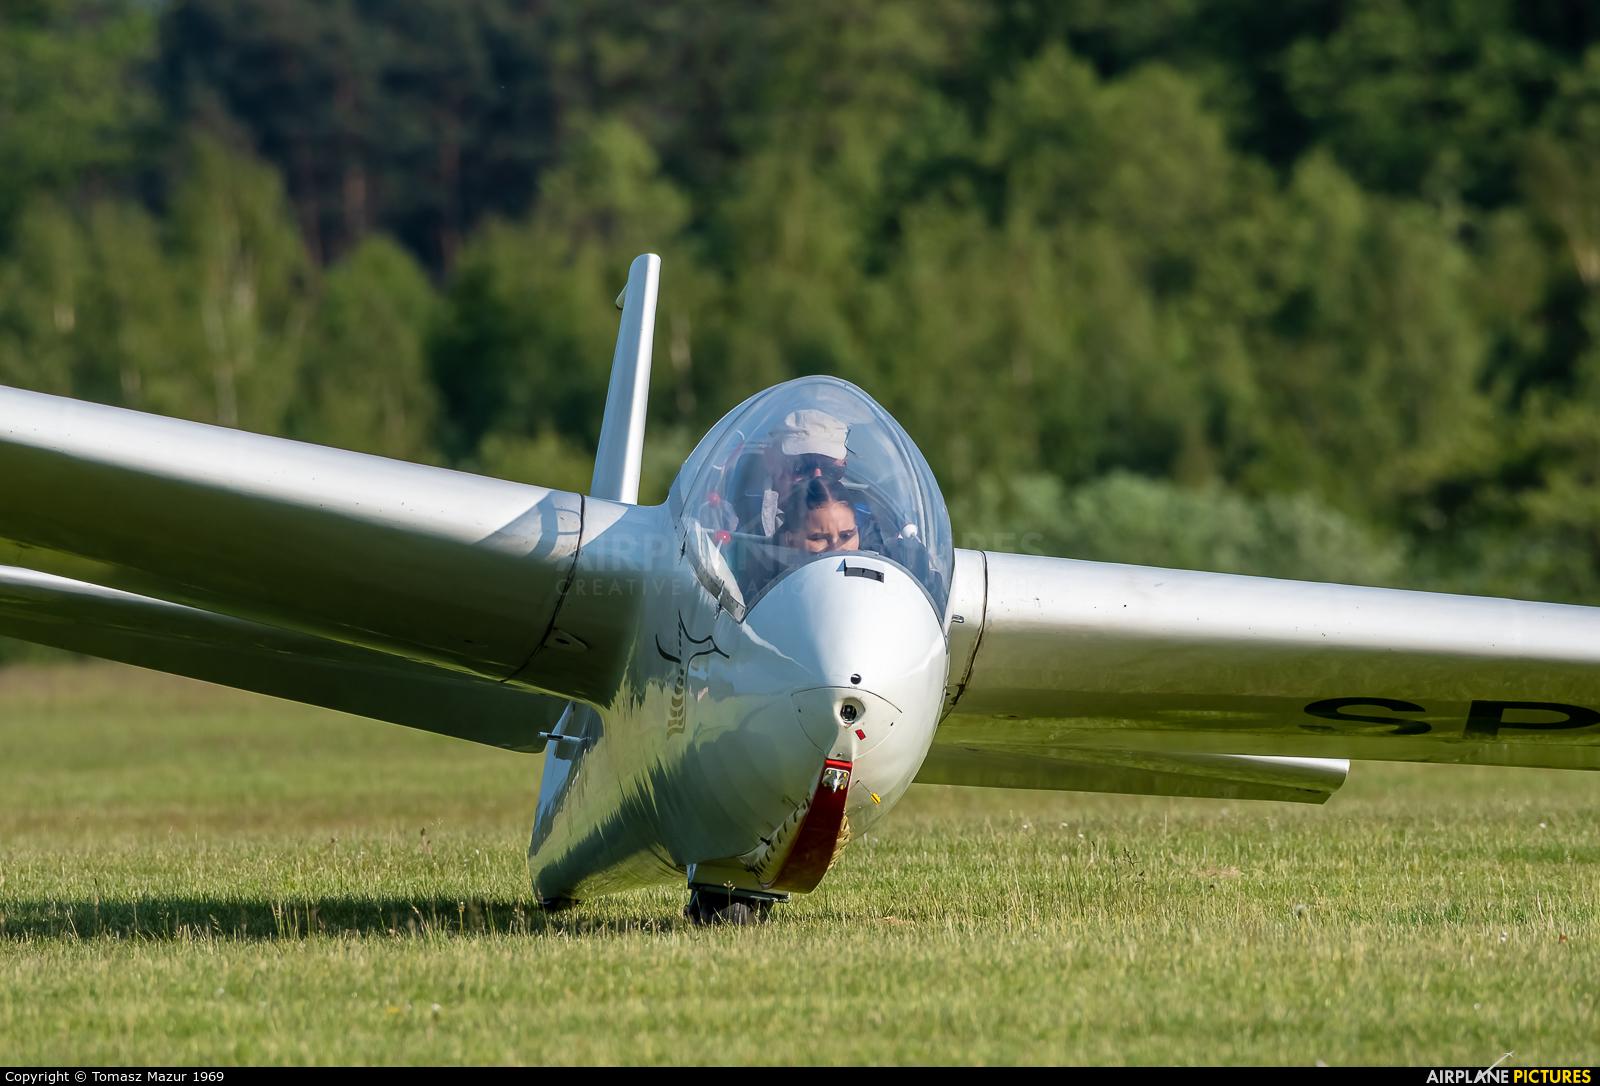 Aeroclub ROW SP-3987 aircraft at Rybnik - Gotartowice